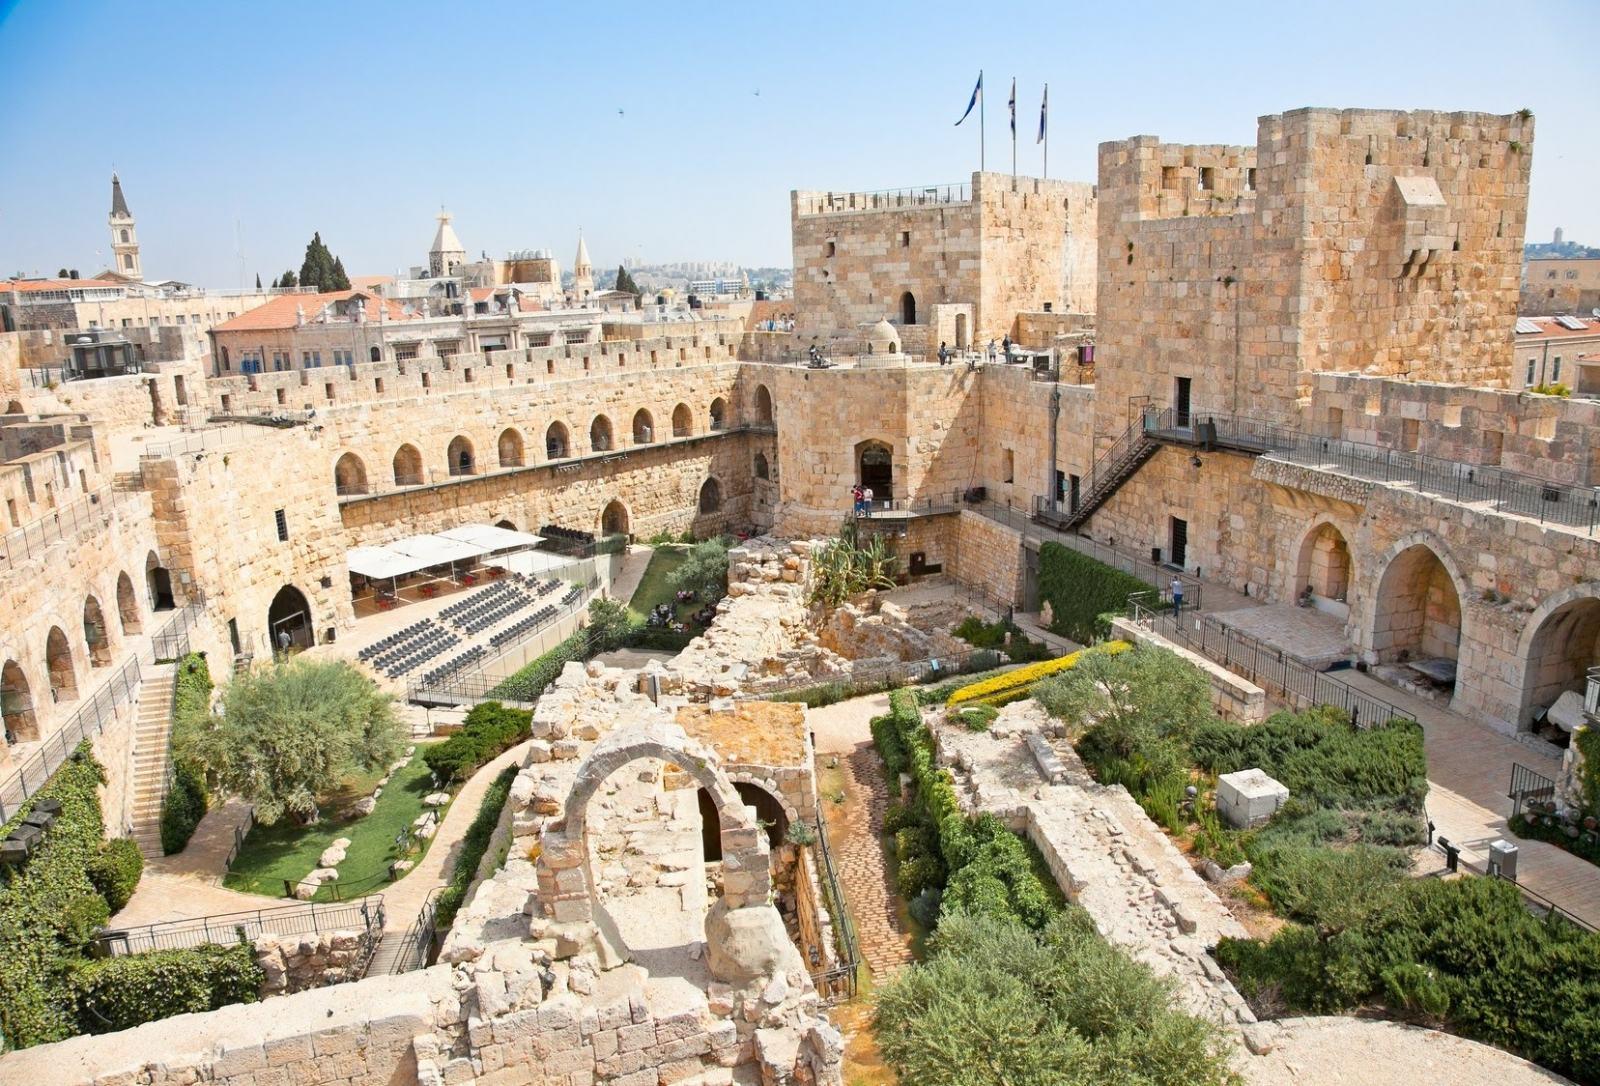 Du lịch Israel - Danh sách Tour Du lịch Israel - Tour Israel